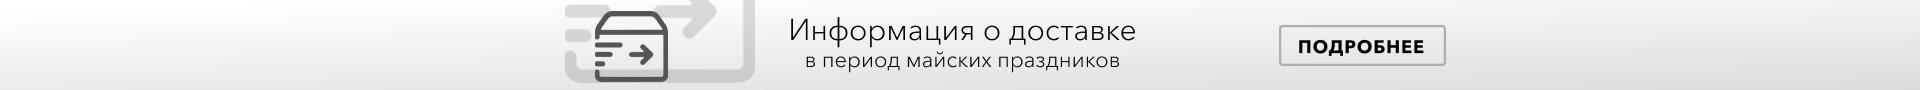 hrCM-top-pc.jpg